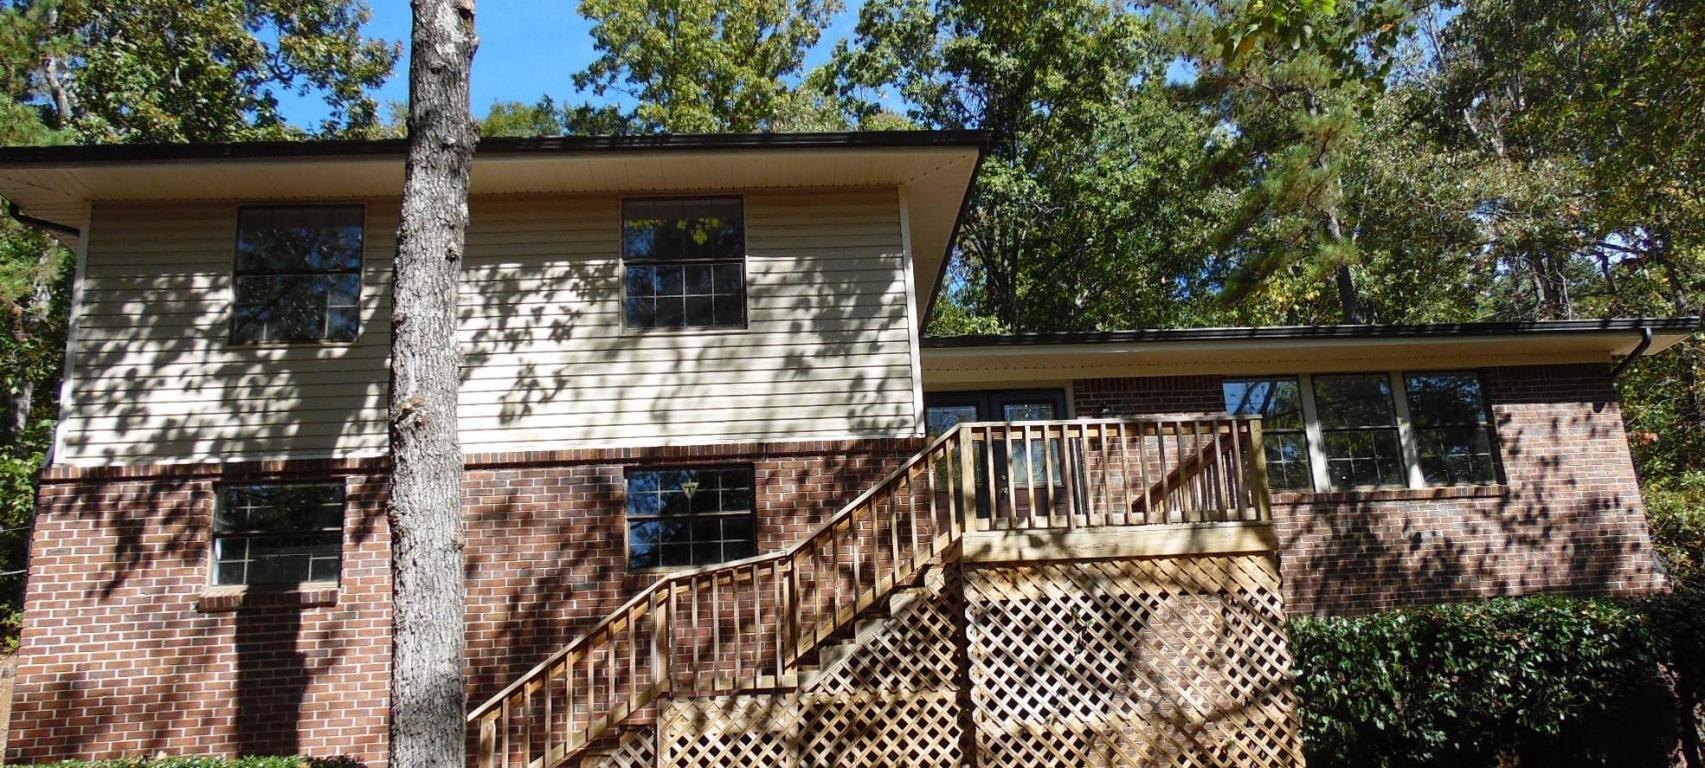 7604 Cove Ridge Dr, Hixson, TN | MLS# 1255440 | Sabrena